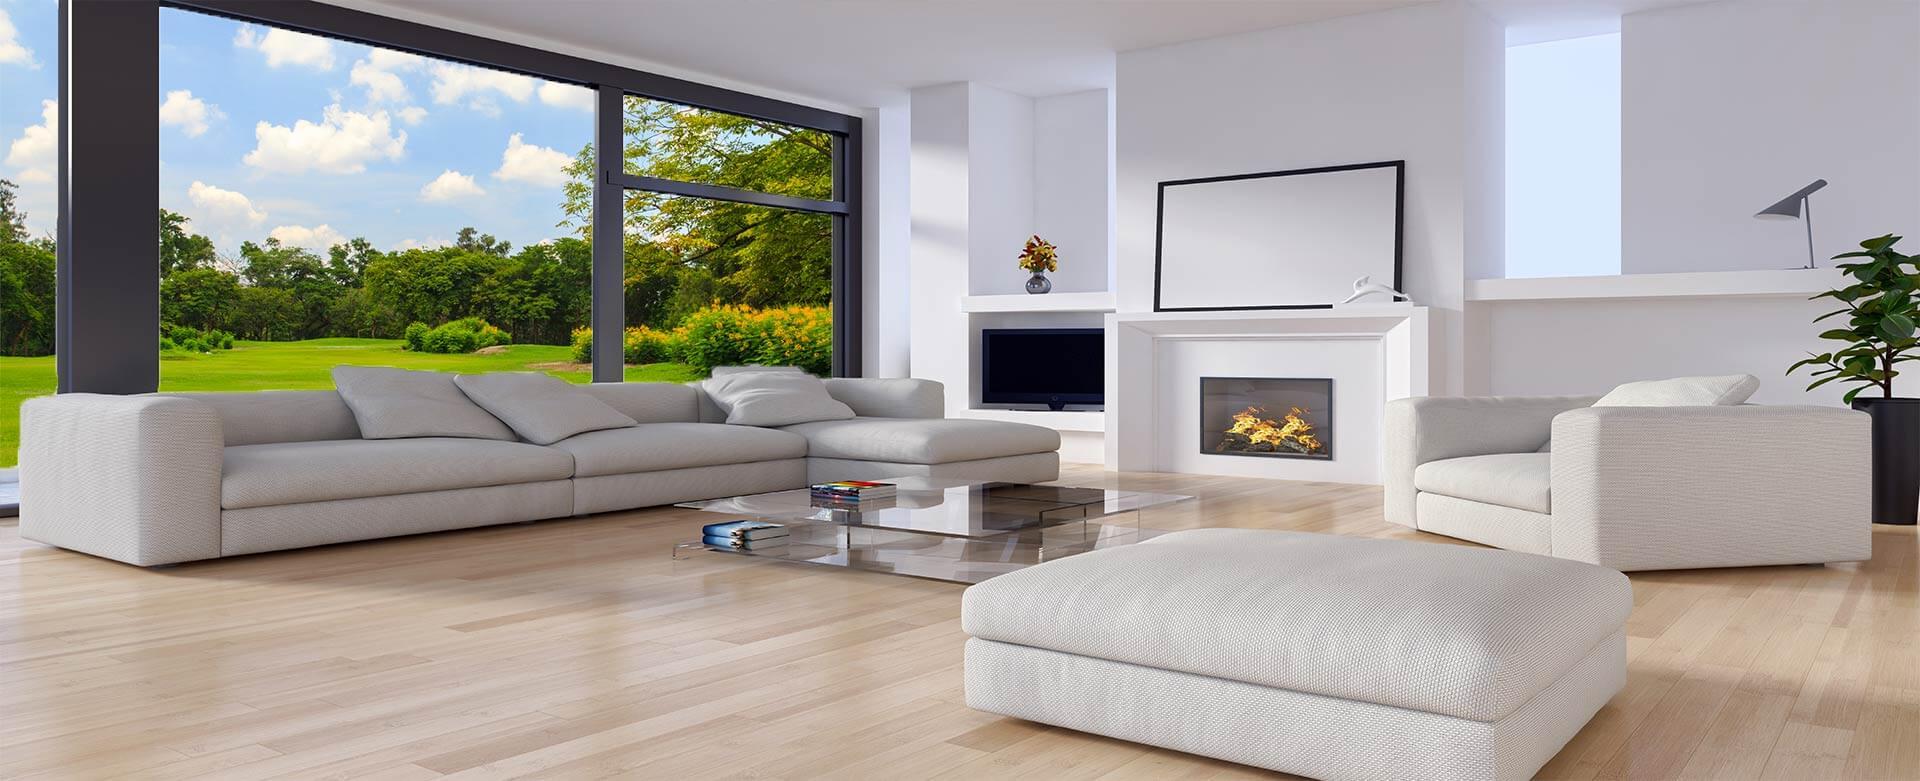 Petites annonces immobili res immobilier france for Petites annonces immobilier